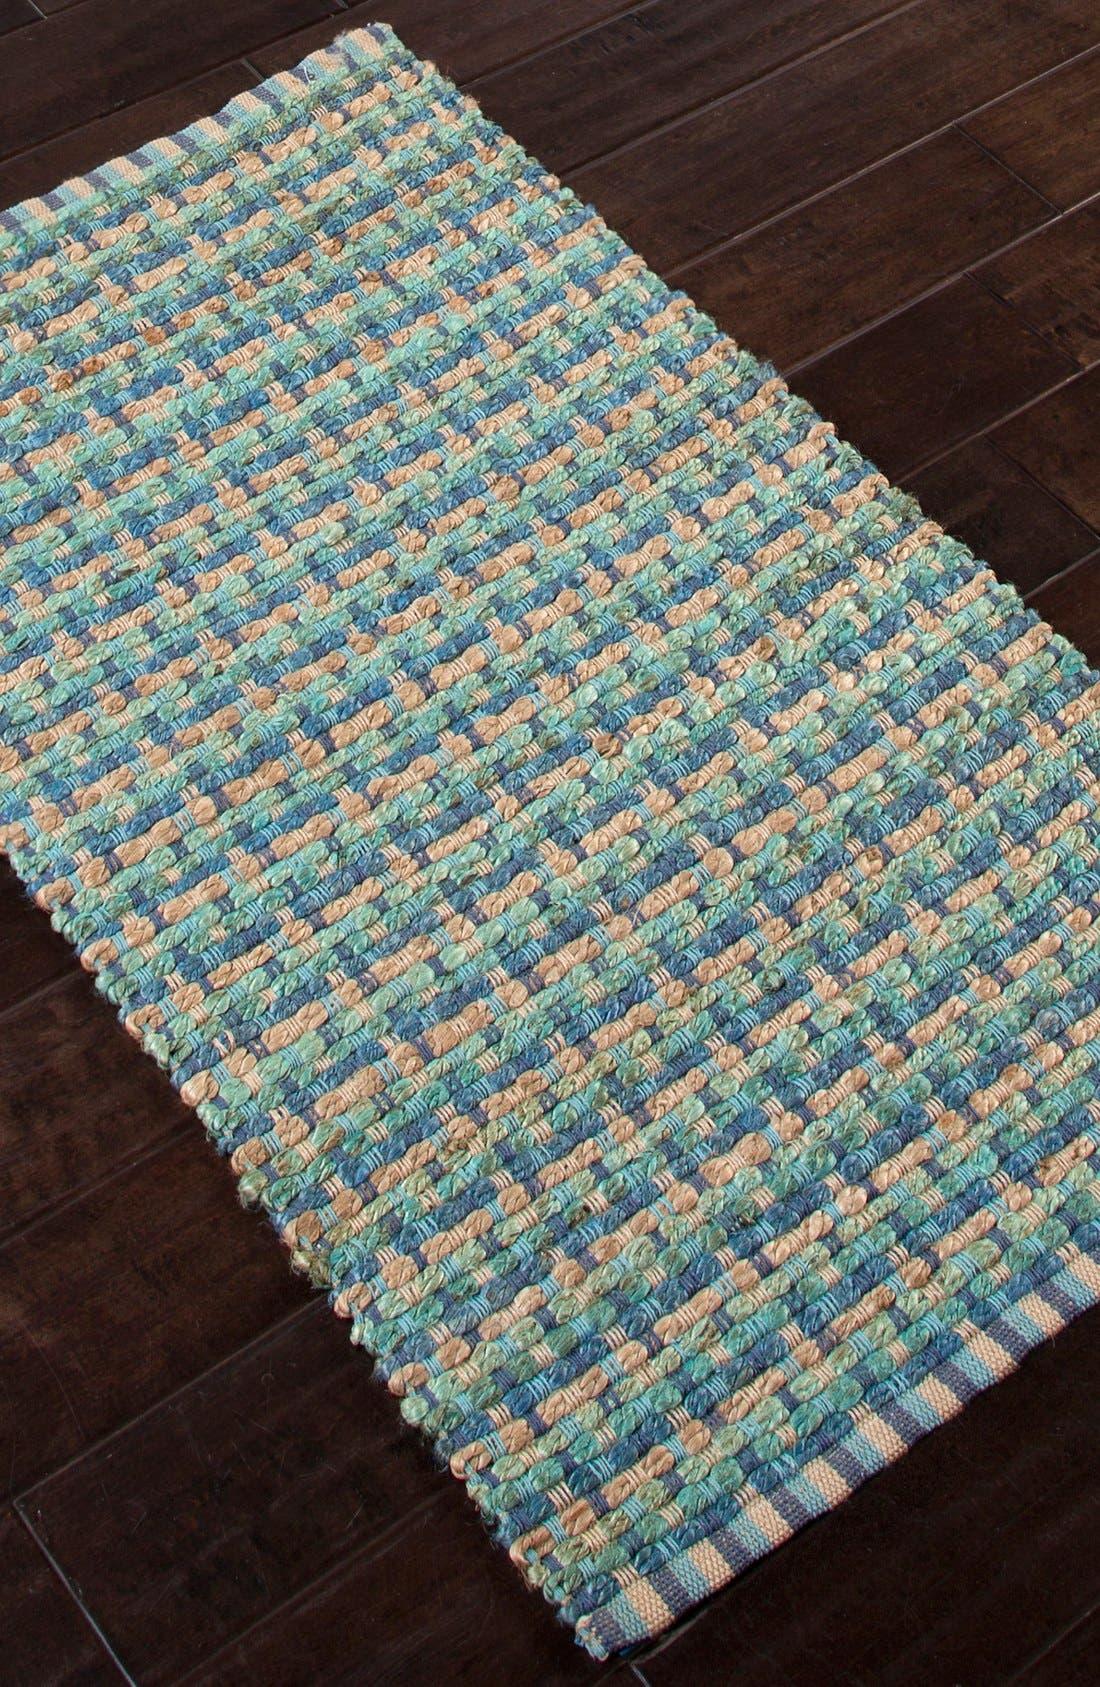 'Manchester' Jute & Cotton Accent Rug,                             Alternate thumbnail 5, color,                             Blue/ Taupe